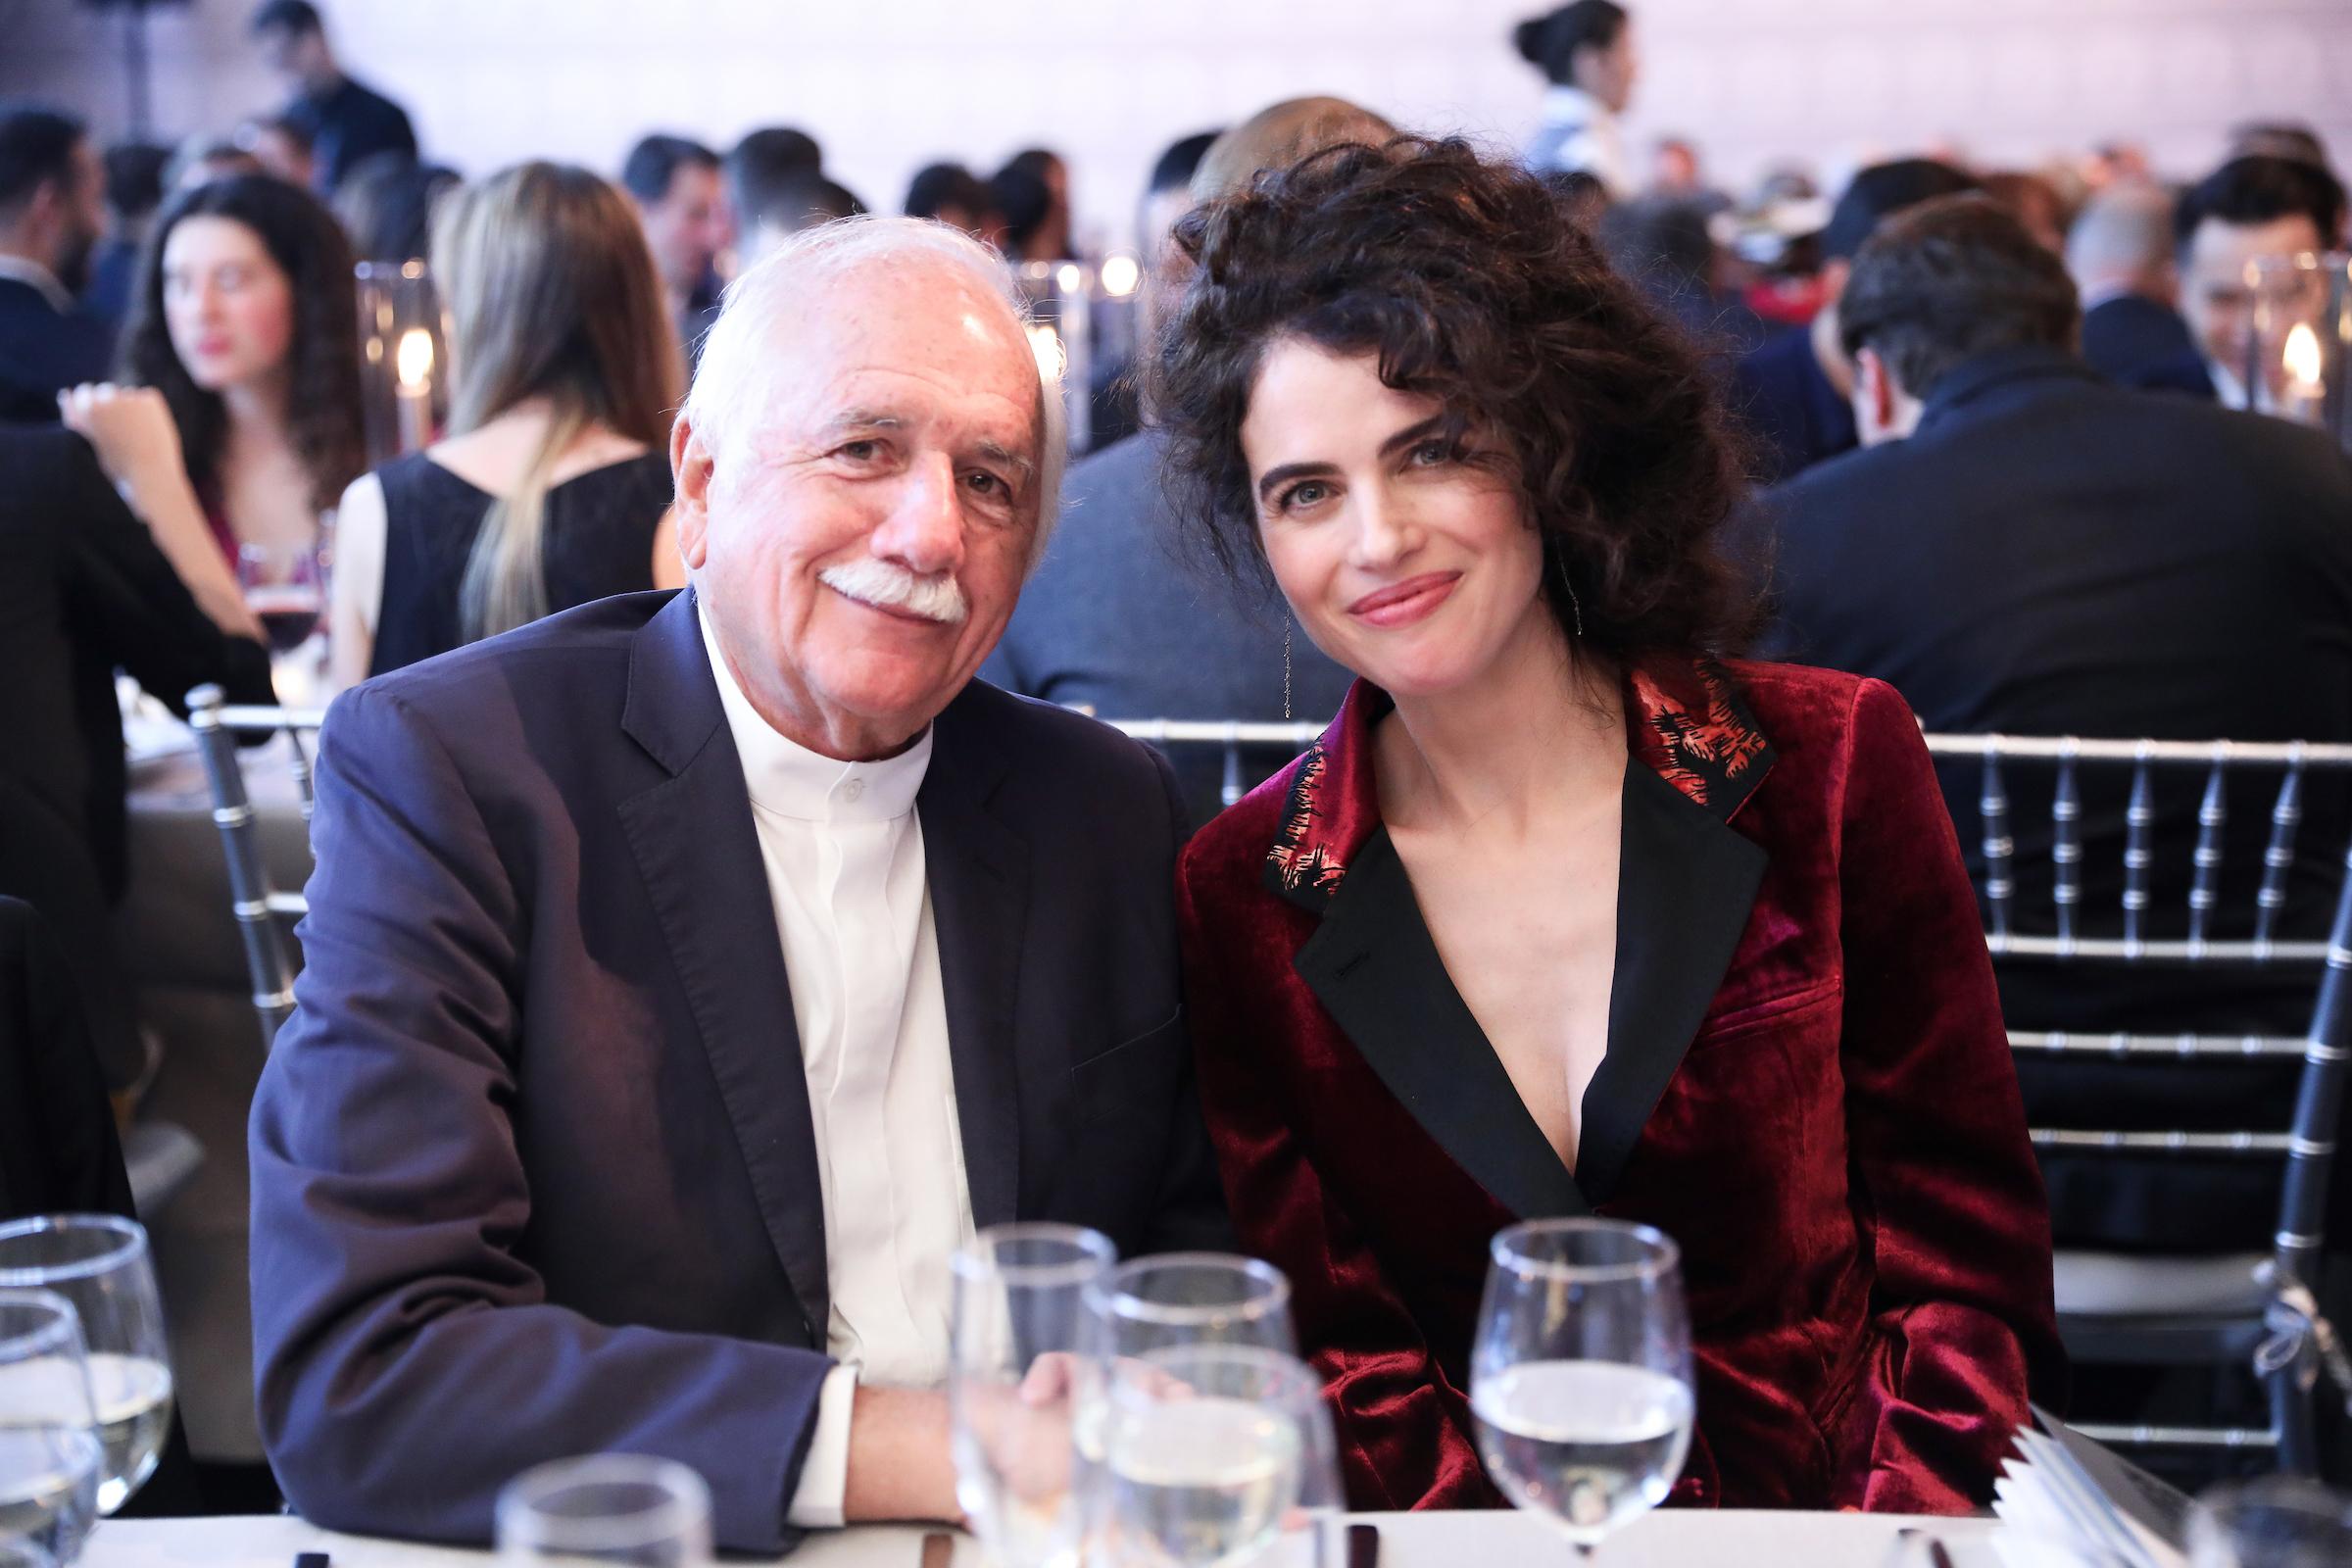 Moshe Sadfie and Neri Oxman. Photo: Samantha Nandez/BFA.com